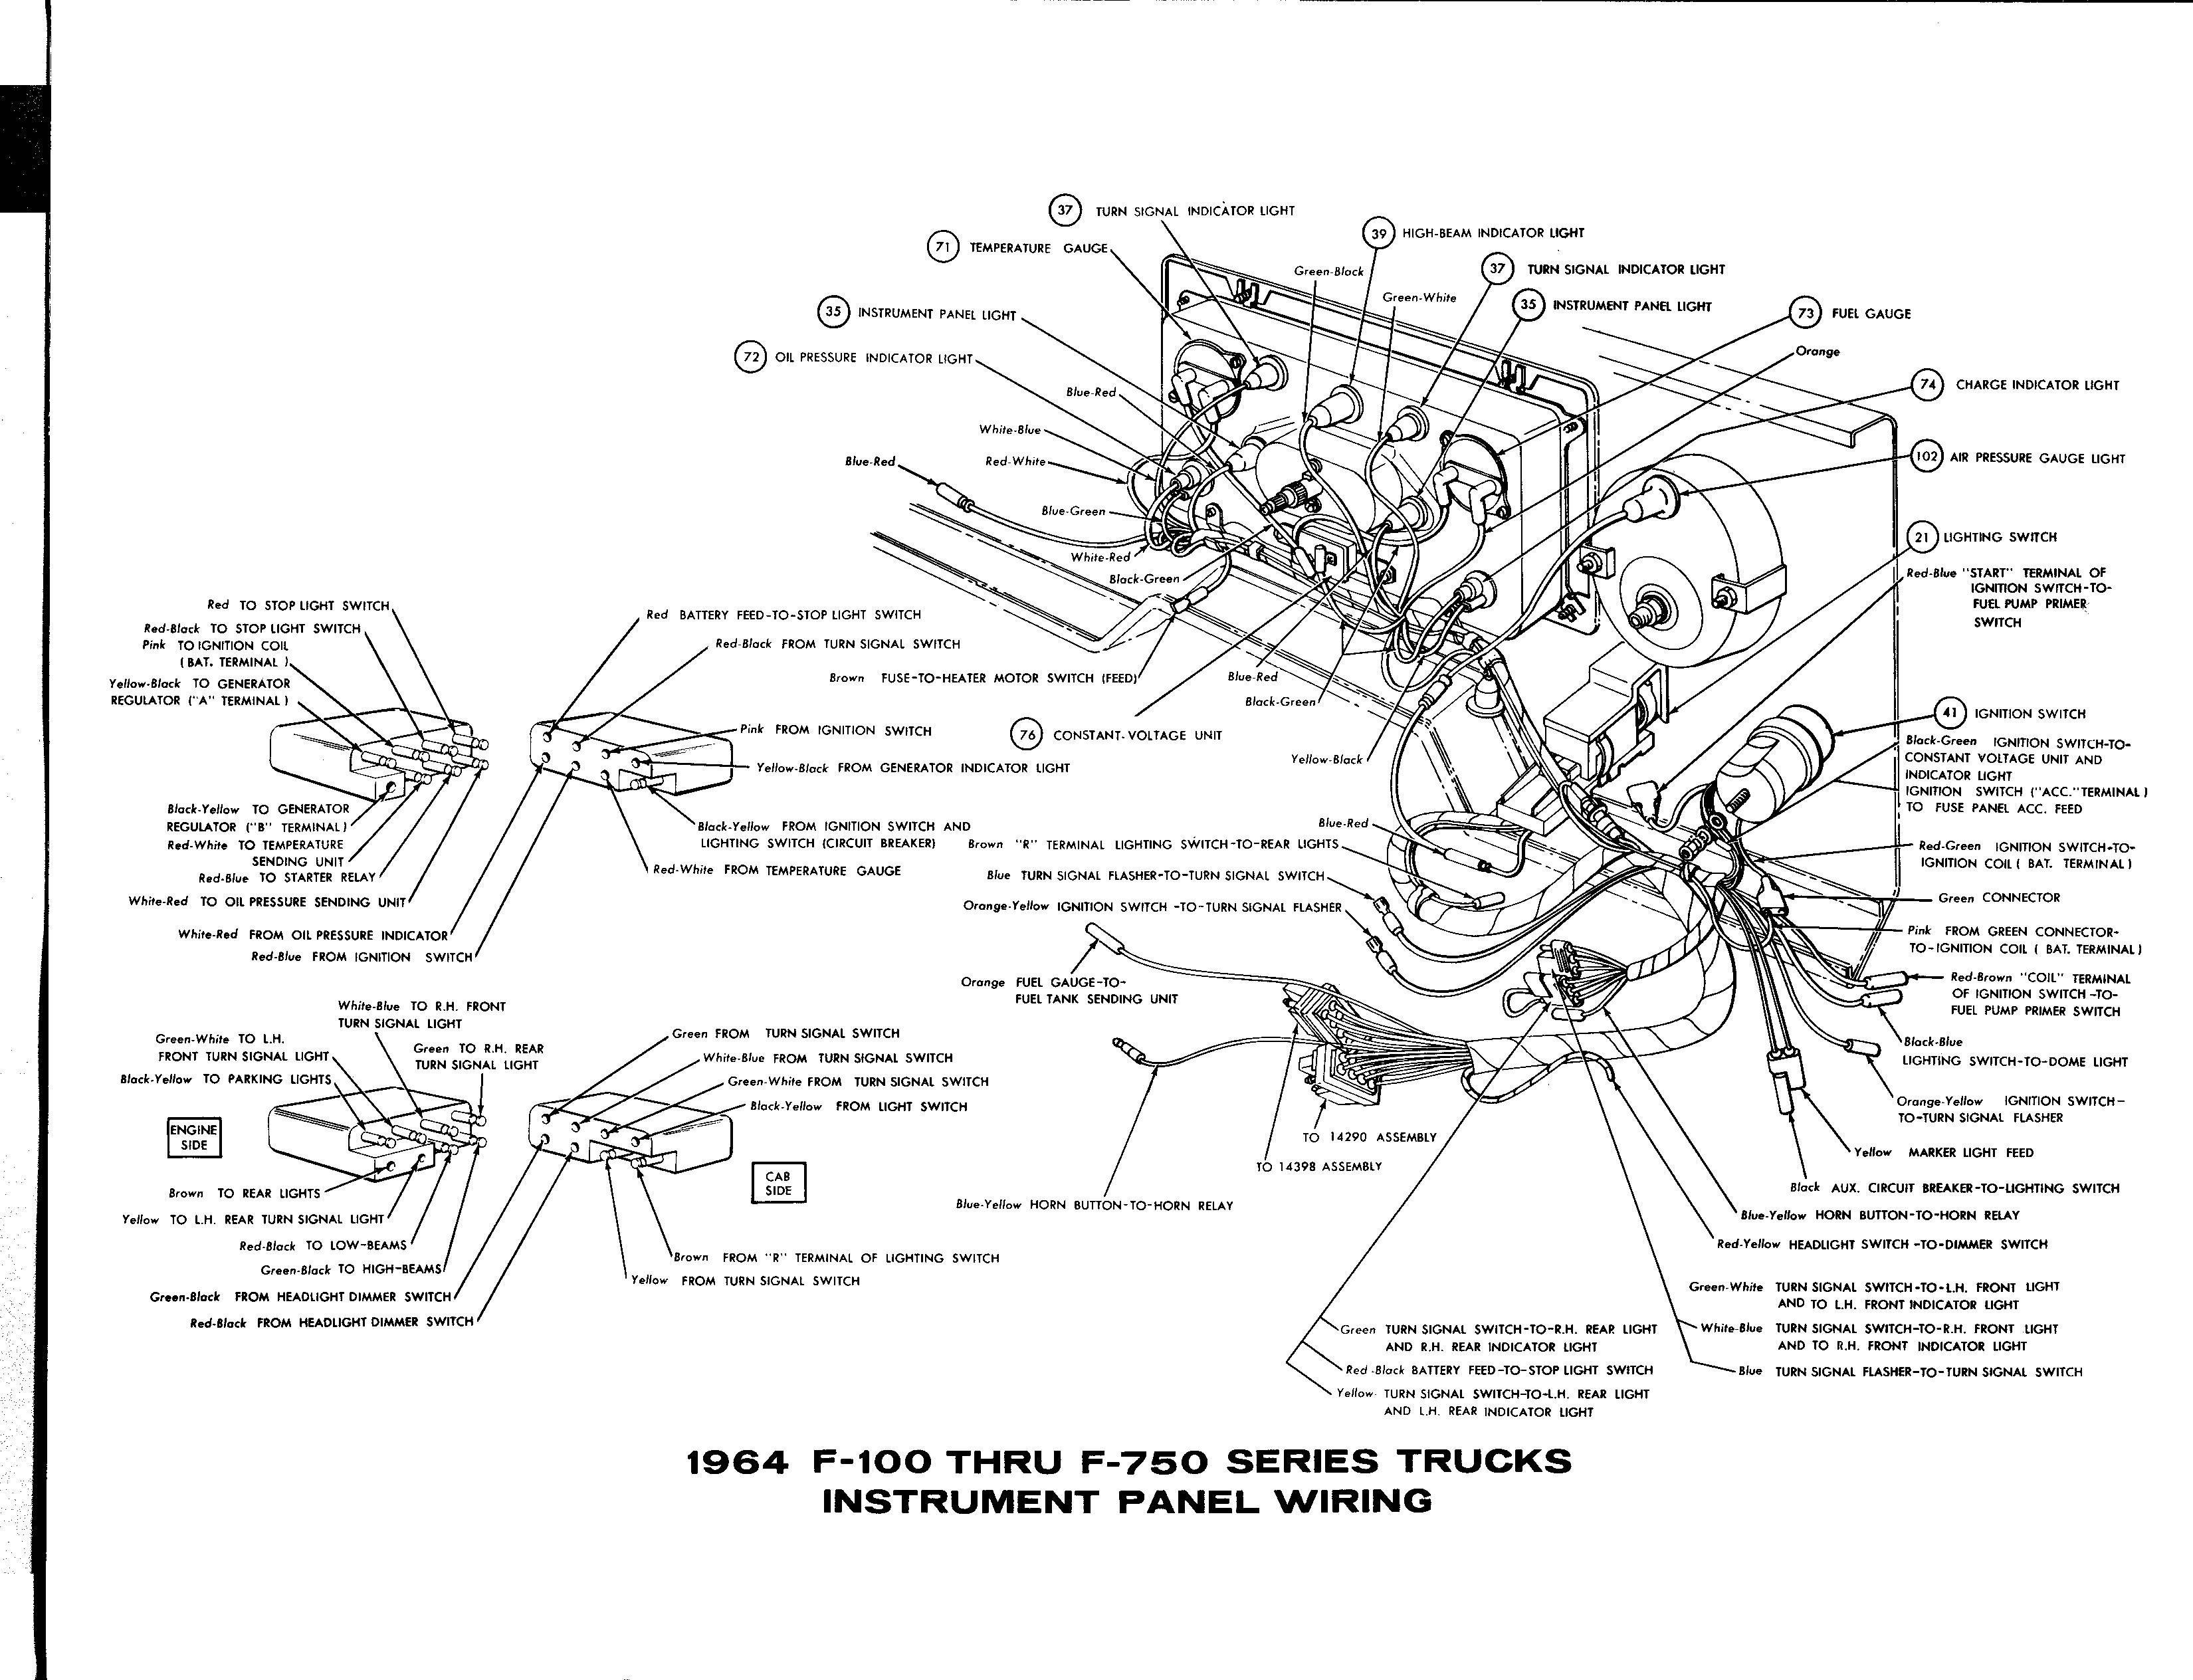 78 F150 Wiring Diagram